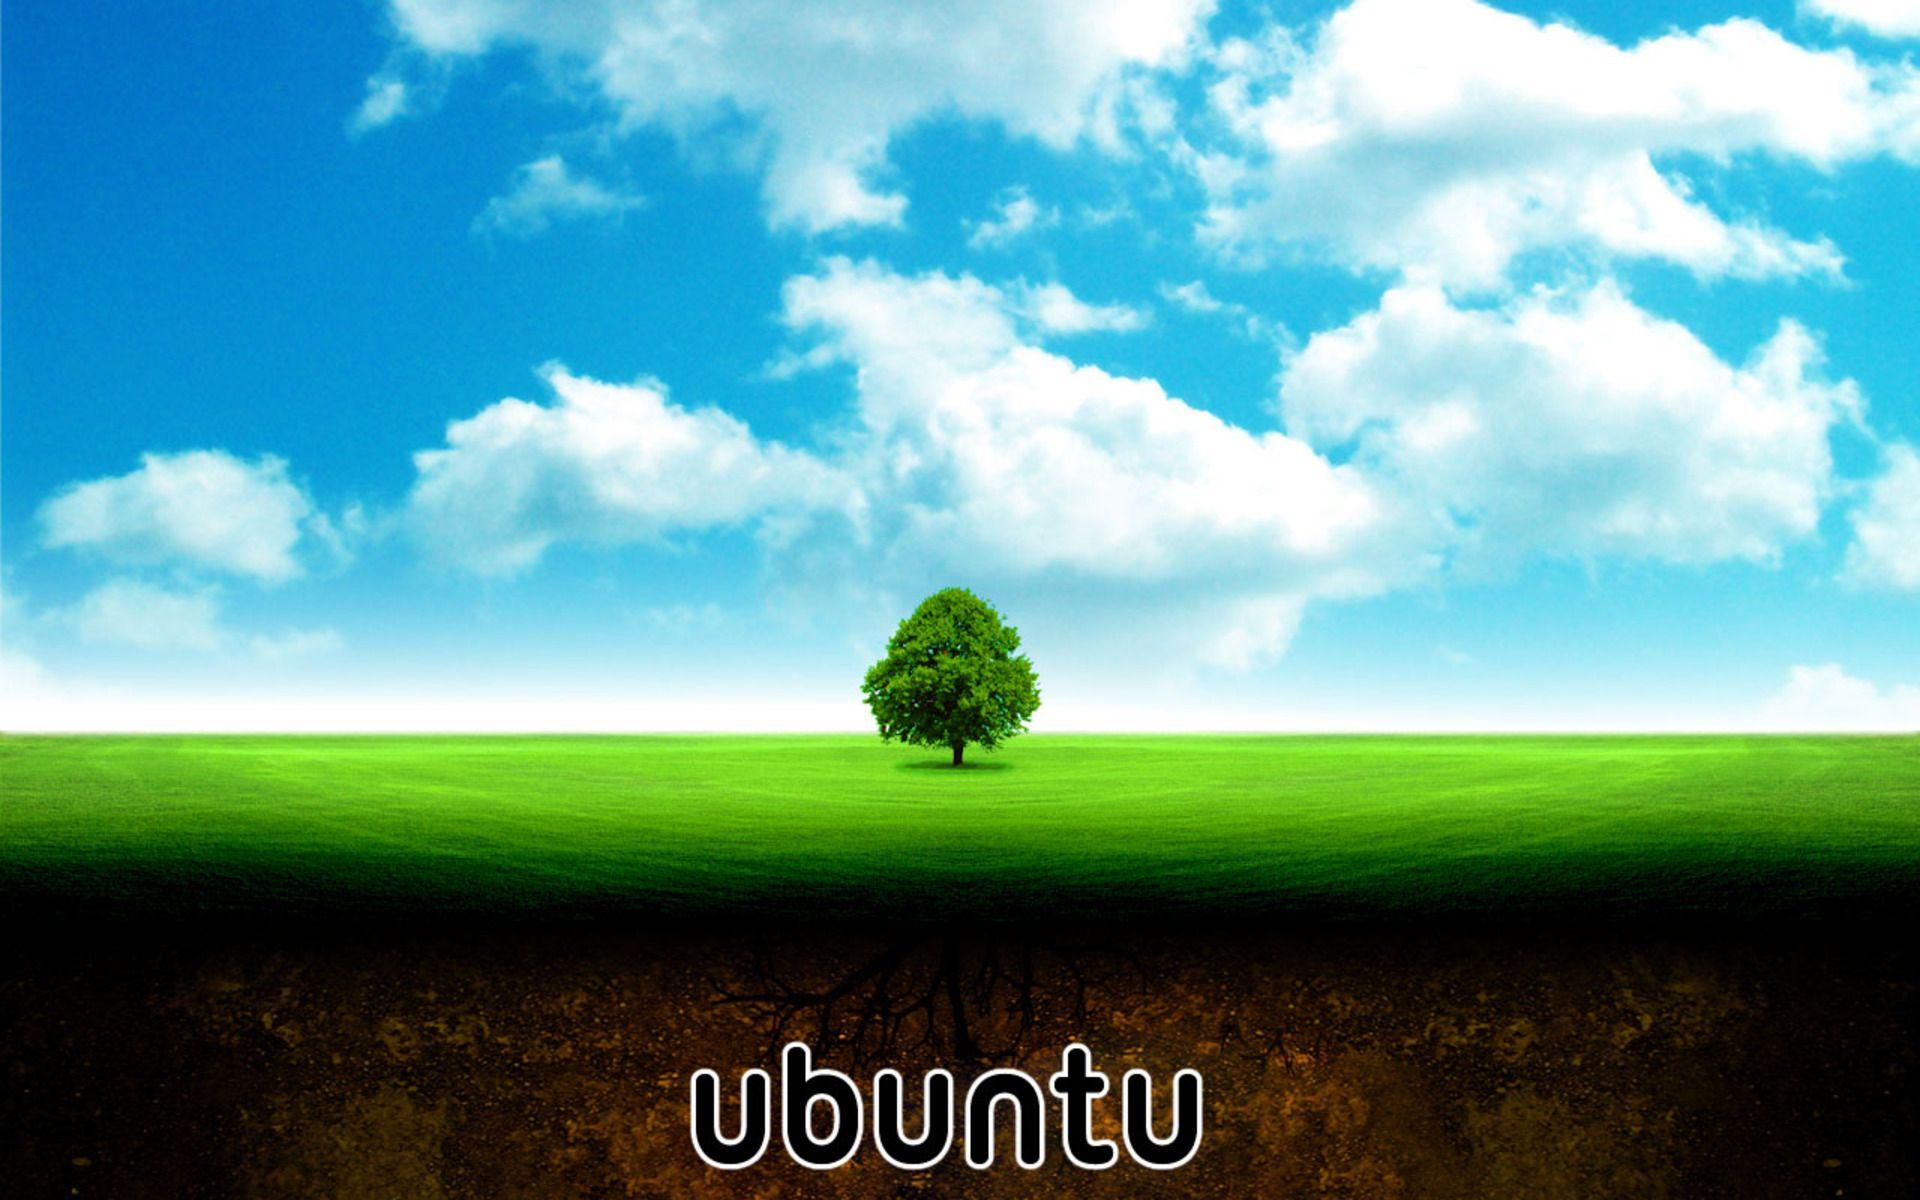 60 fondos de escritorio para ubuntu muylinux - Fondos de escritorio guapos ...